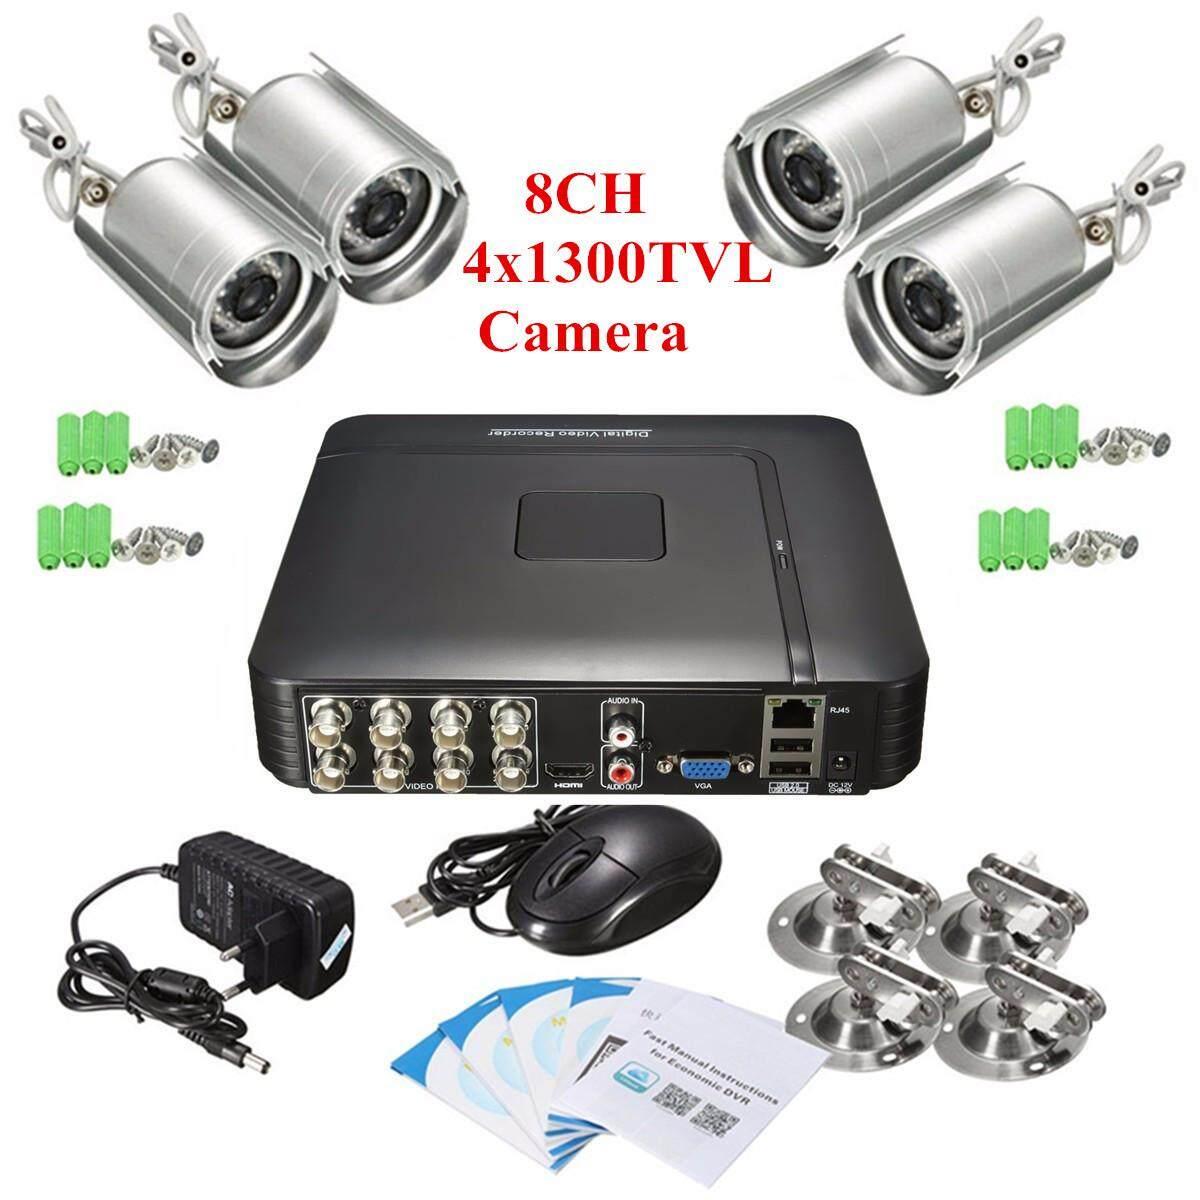 H.264 8ch Cctv Dvr 1300tvl Surveillance Security System With 4 Ir Night Camera - Intl By Audew.